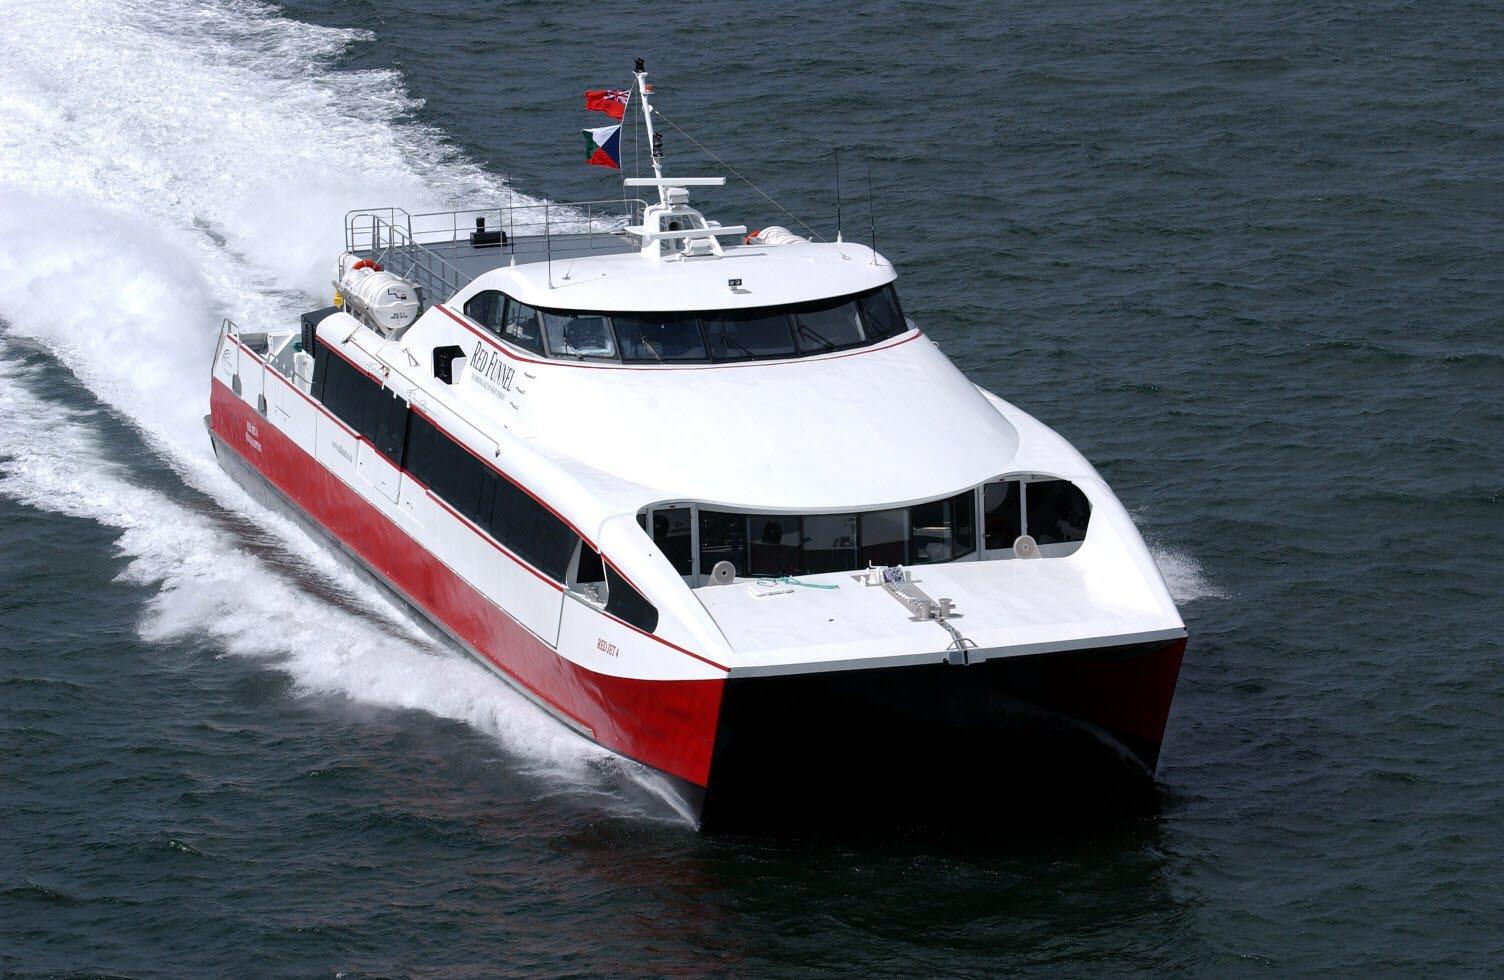 red-funnel-high-speed-boat.jpg